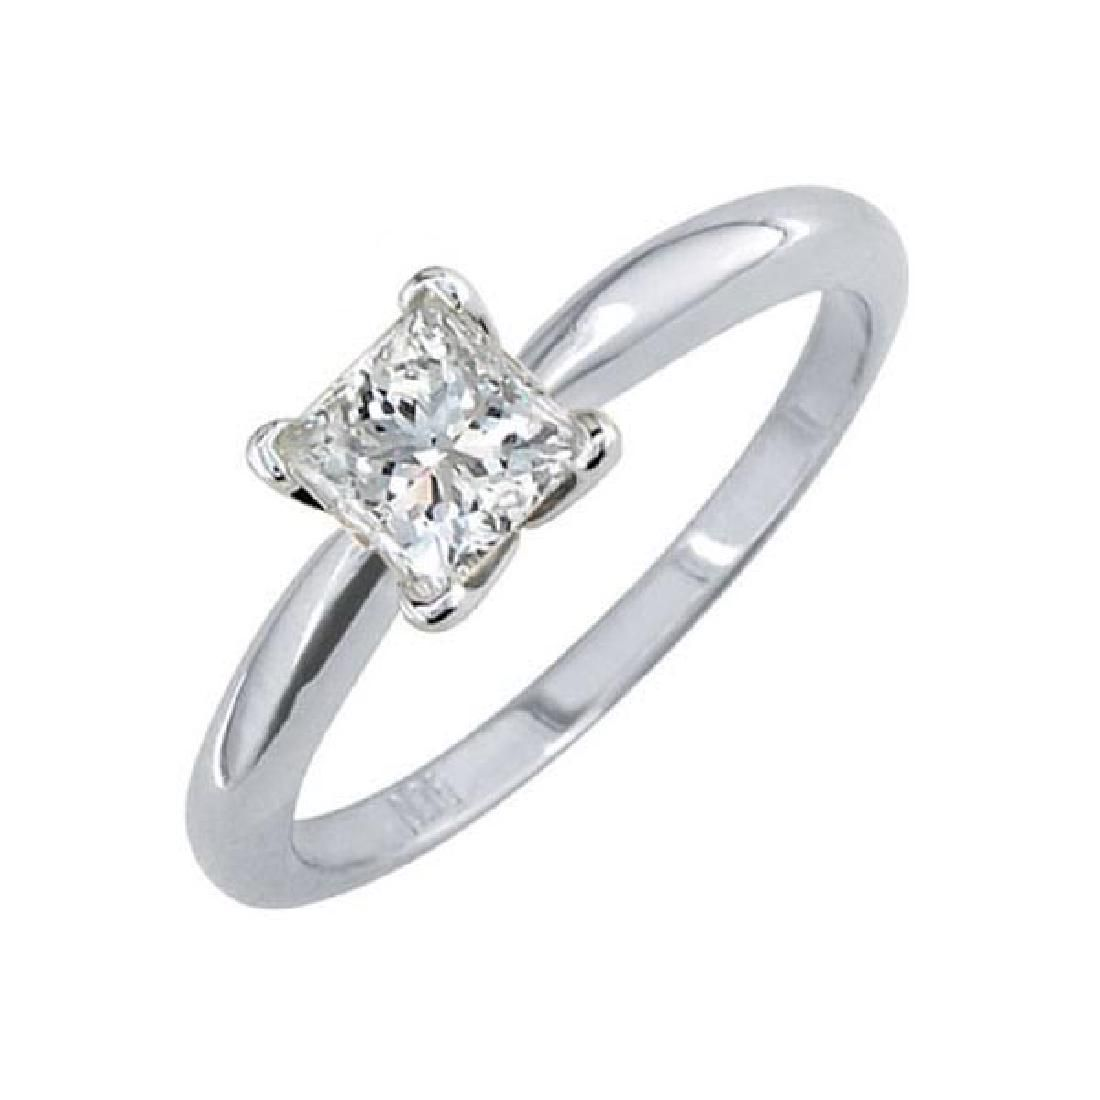 Certified 097 CTW Princess Diamond Solitaire 14k Ring